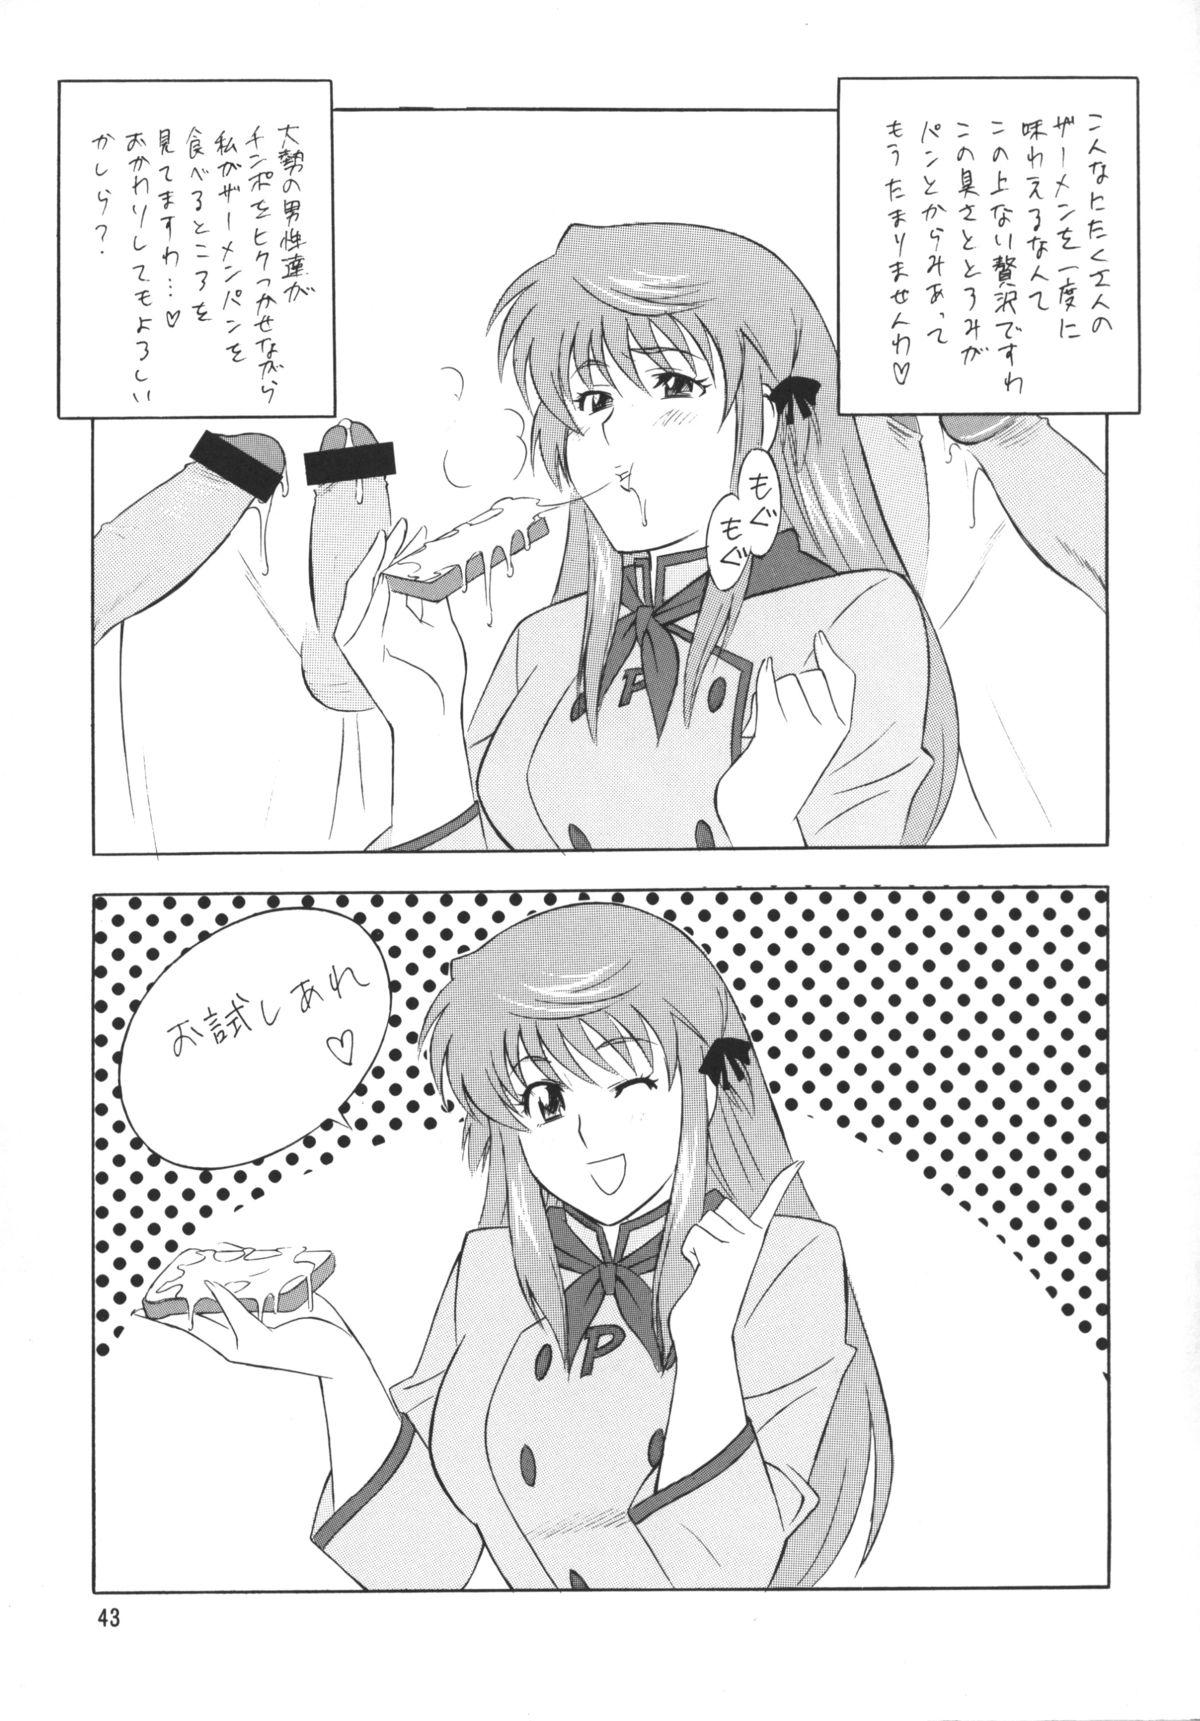 [Okachimentaiko (H-H, Minazuki Akira) Oh! Hentai (Various) 41